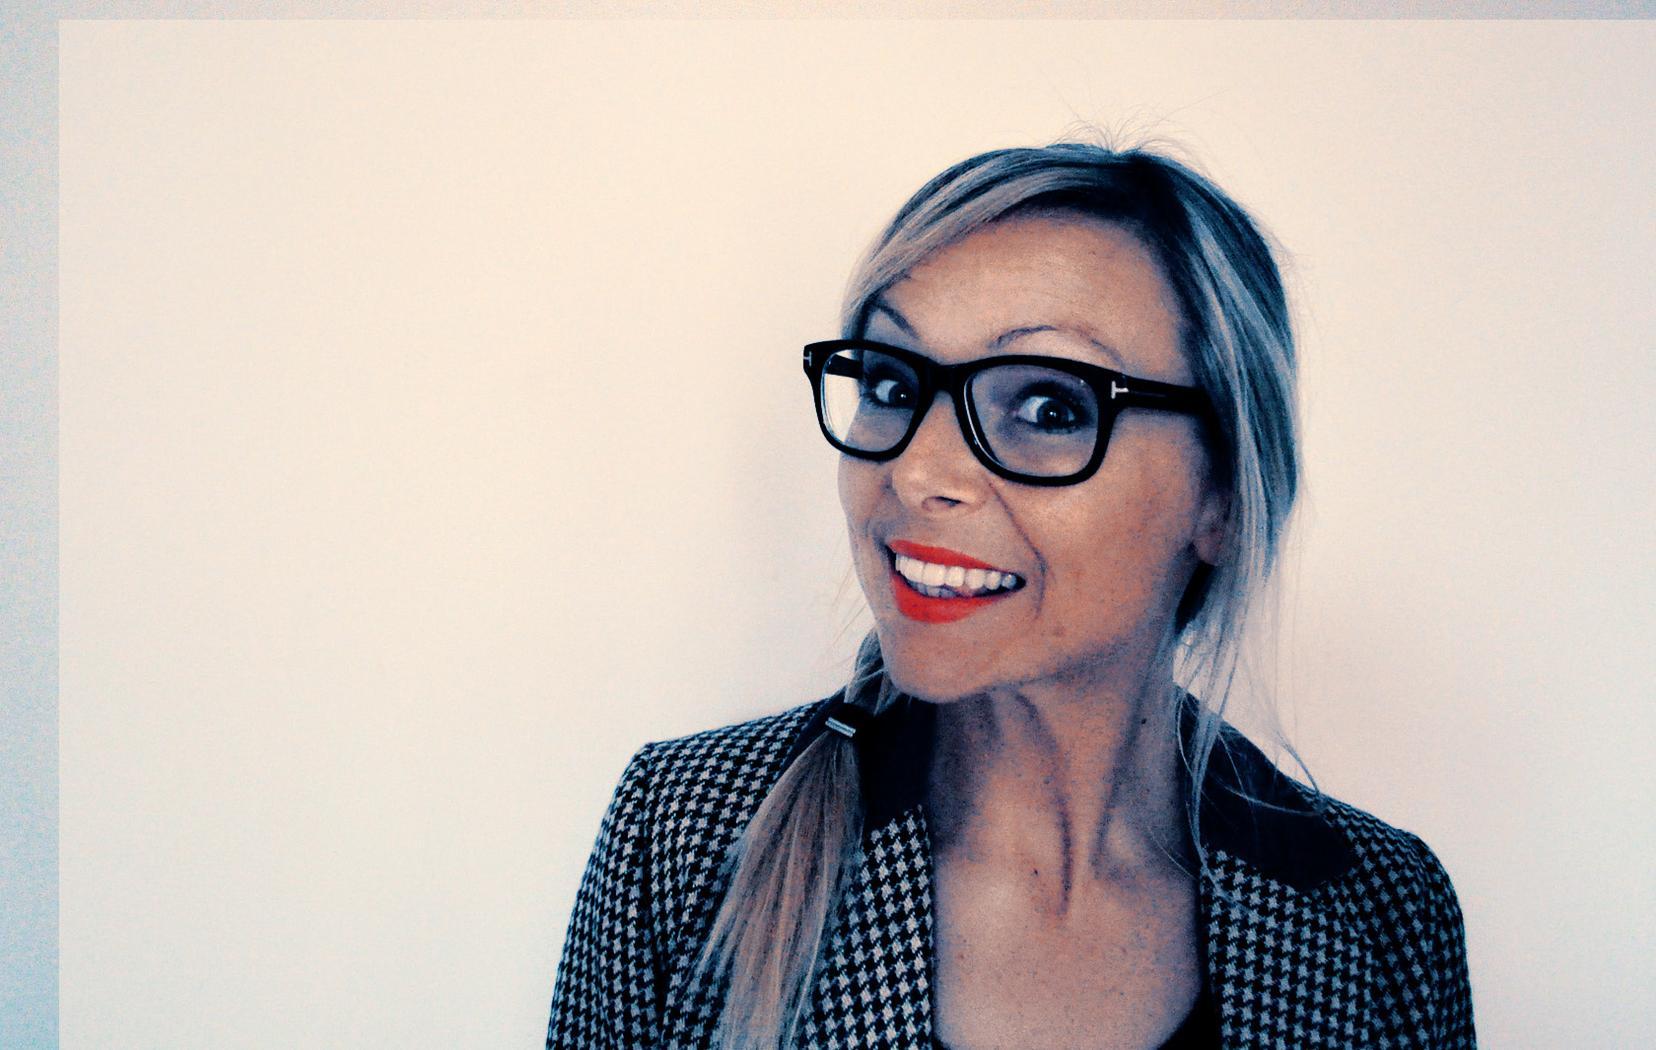 Nathalie Magnée